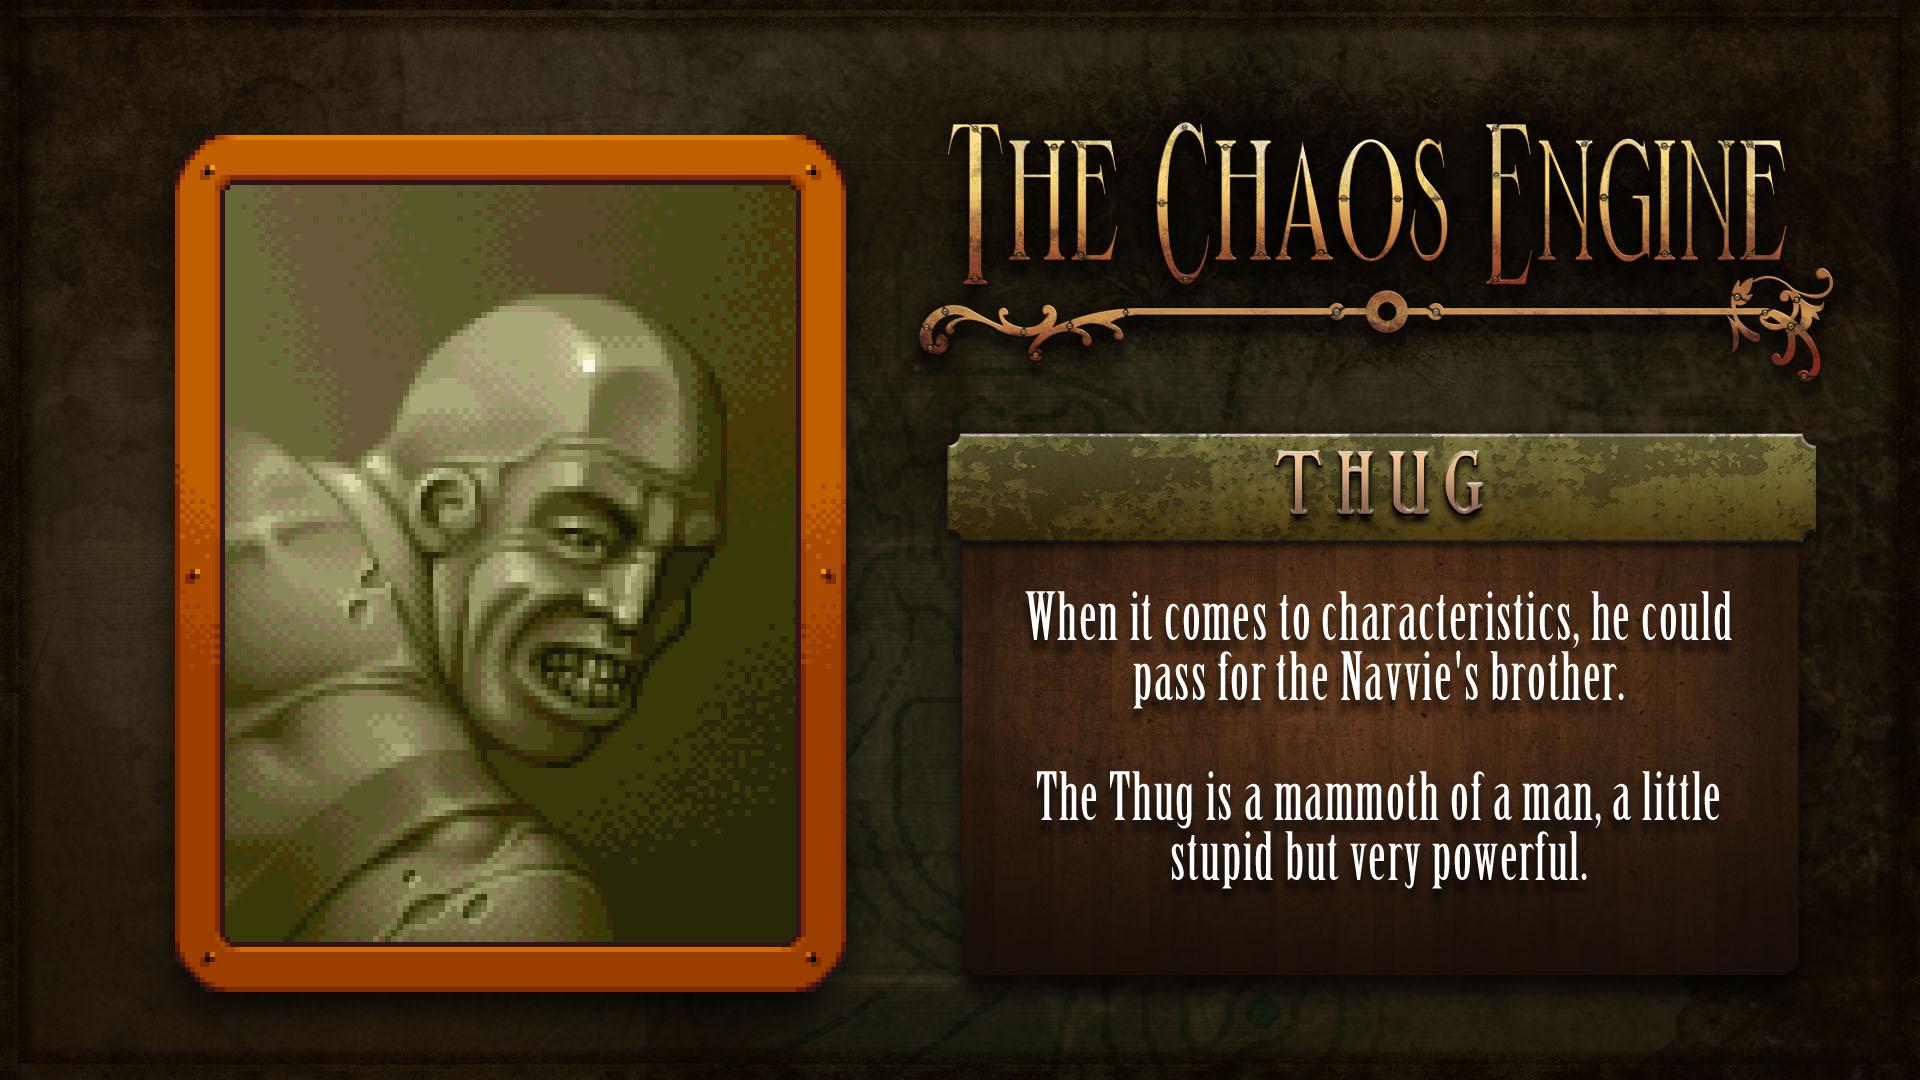 Characteristics of a thug